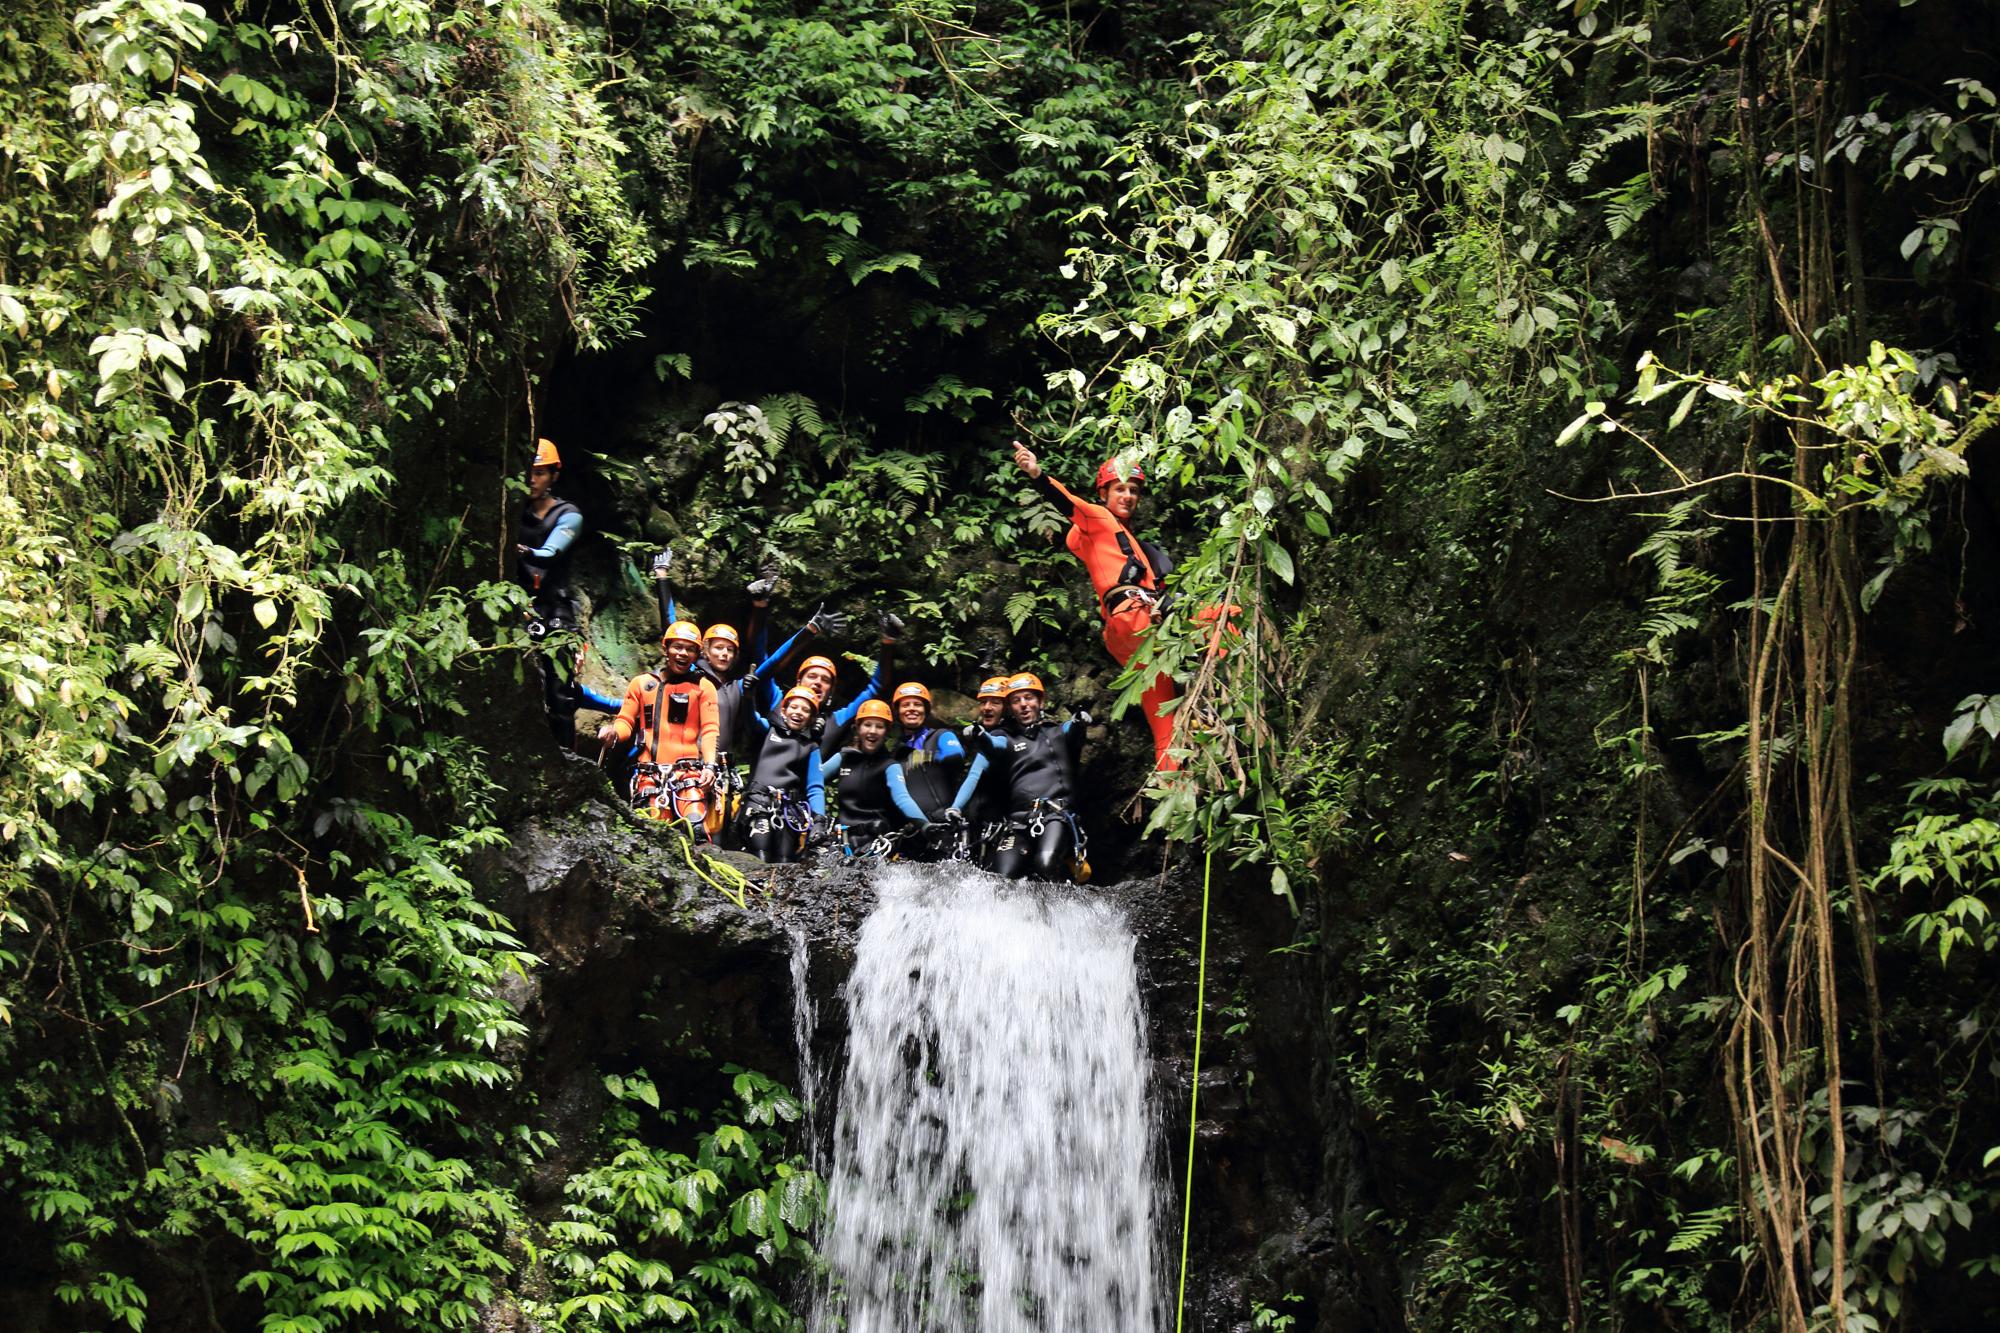 Canyoning_Bali_-_Adventure_&_Spirit_-_2_Kalimudah_abseil_champuan_-_Bali_canyoning